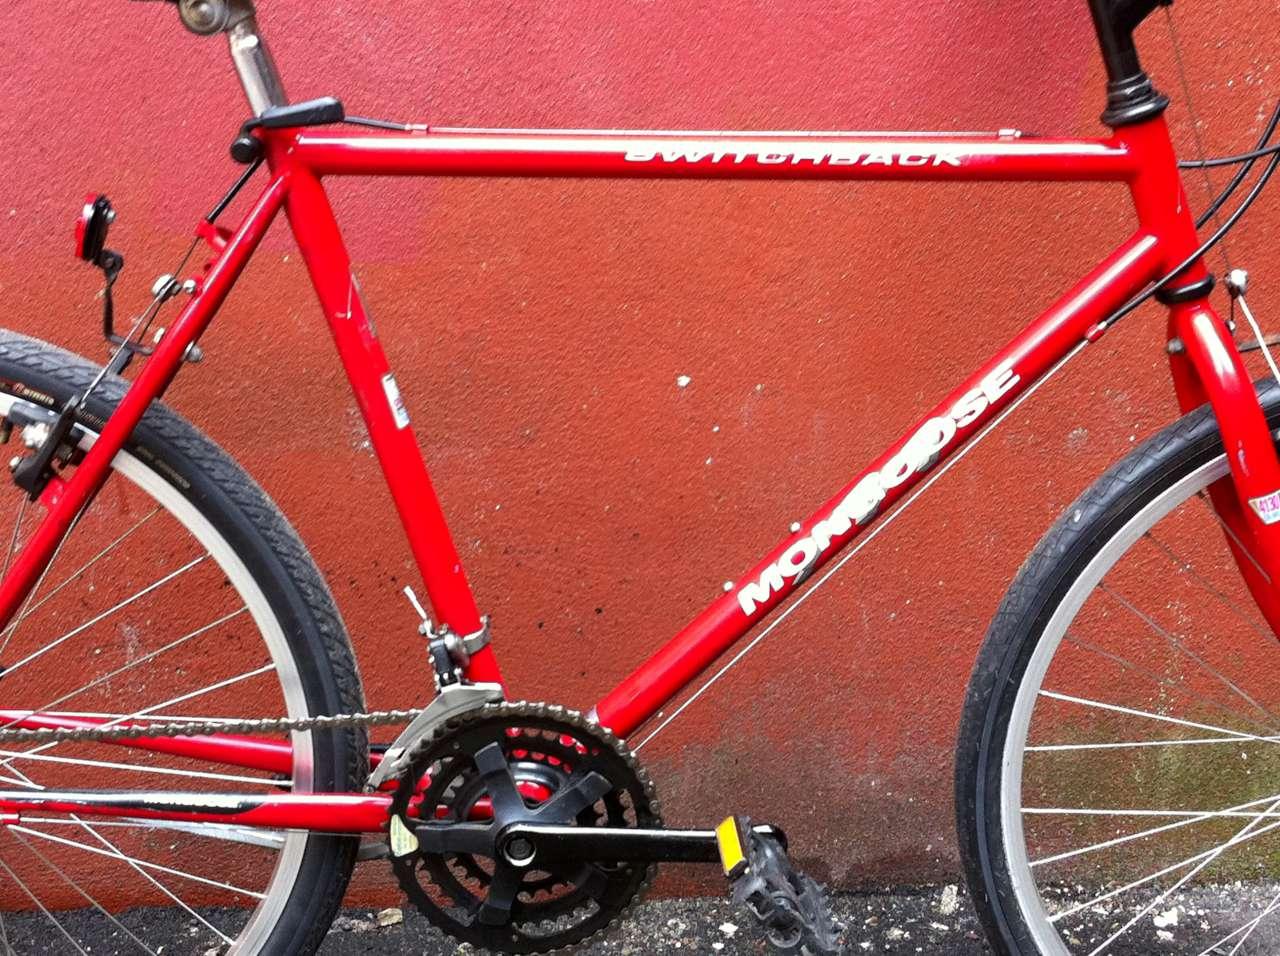 mongoose mountain bike - HD1280×956